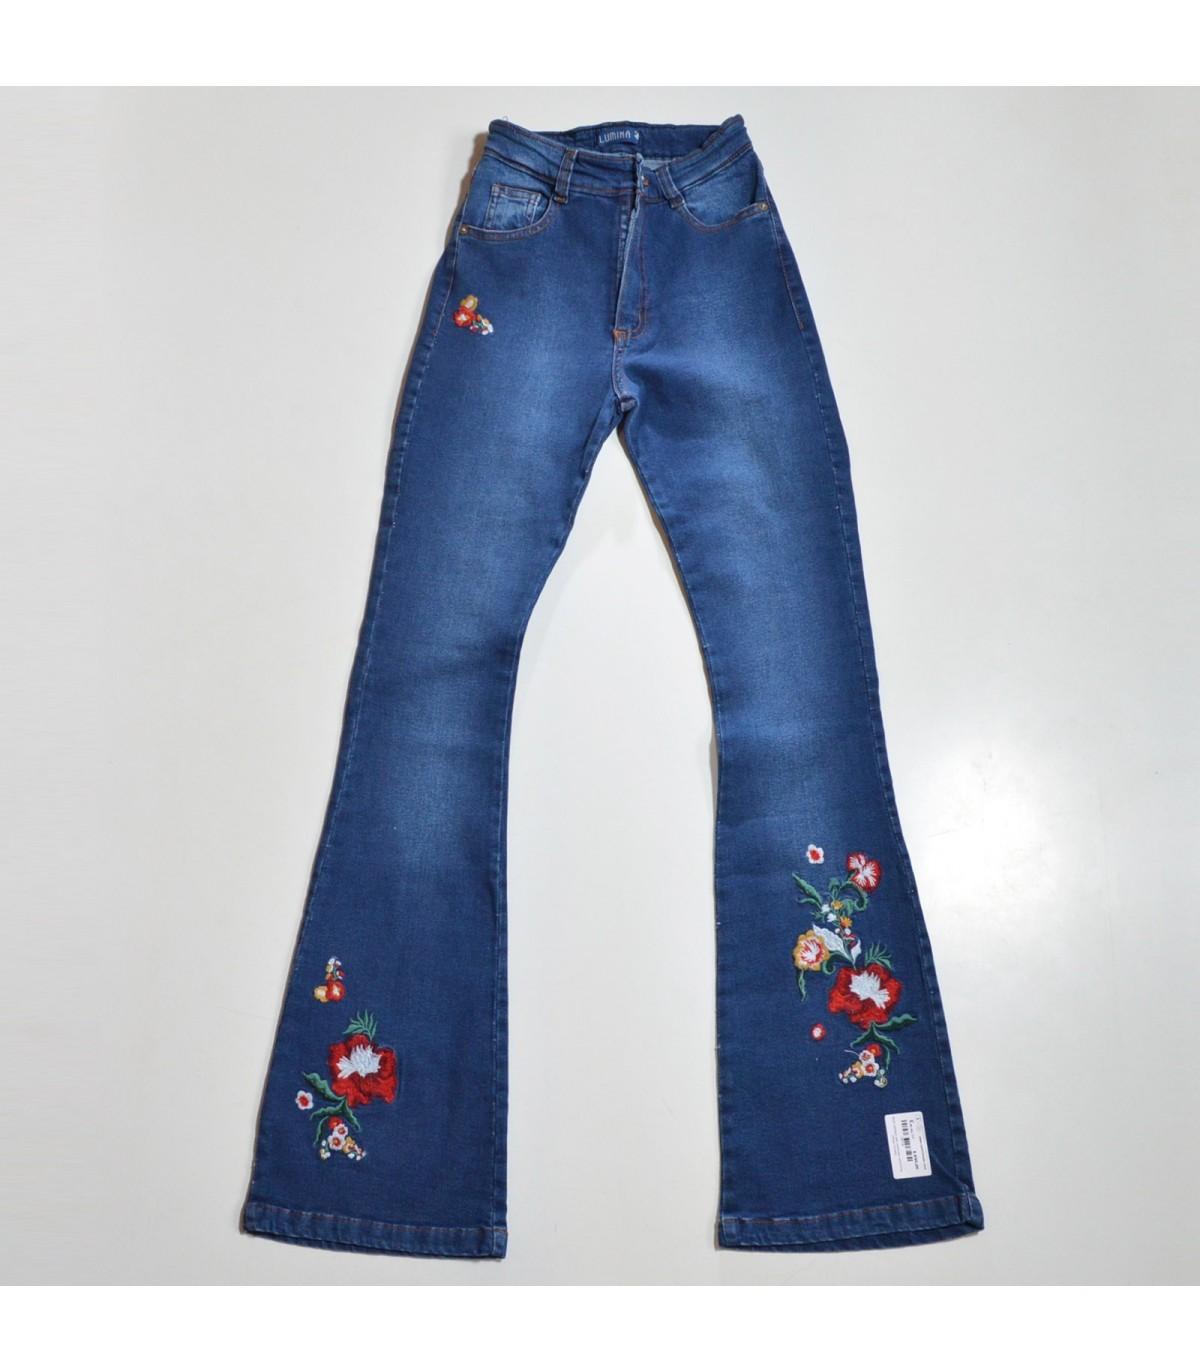 Mujer Pantalon Jean Elastizado Oxford Botamanga Bordada